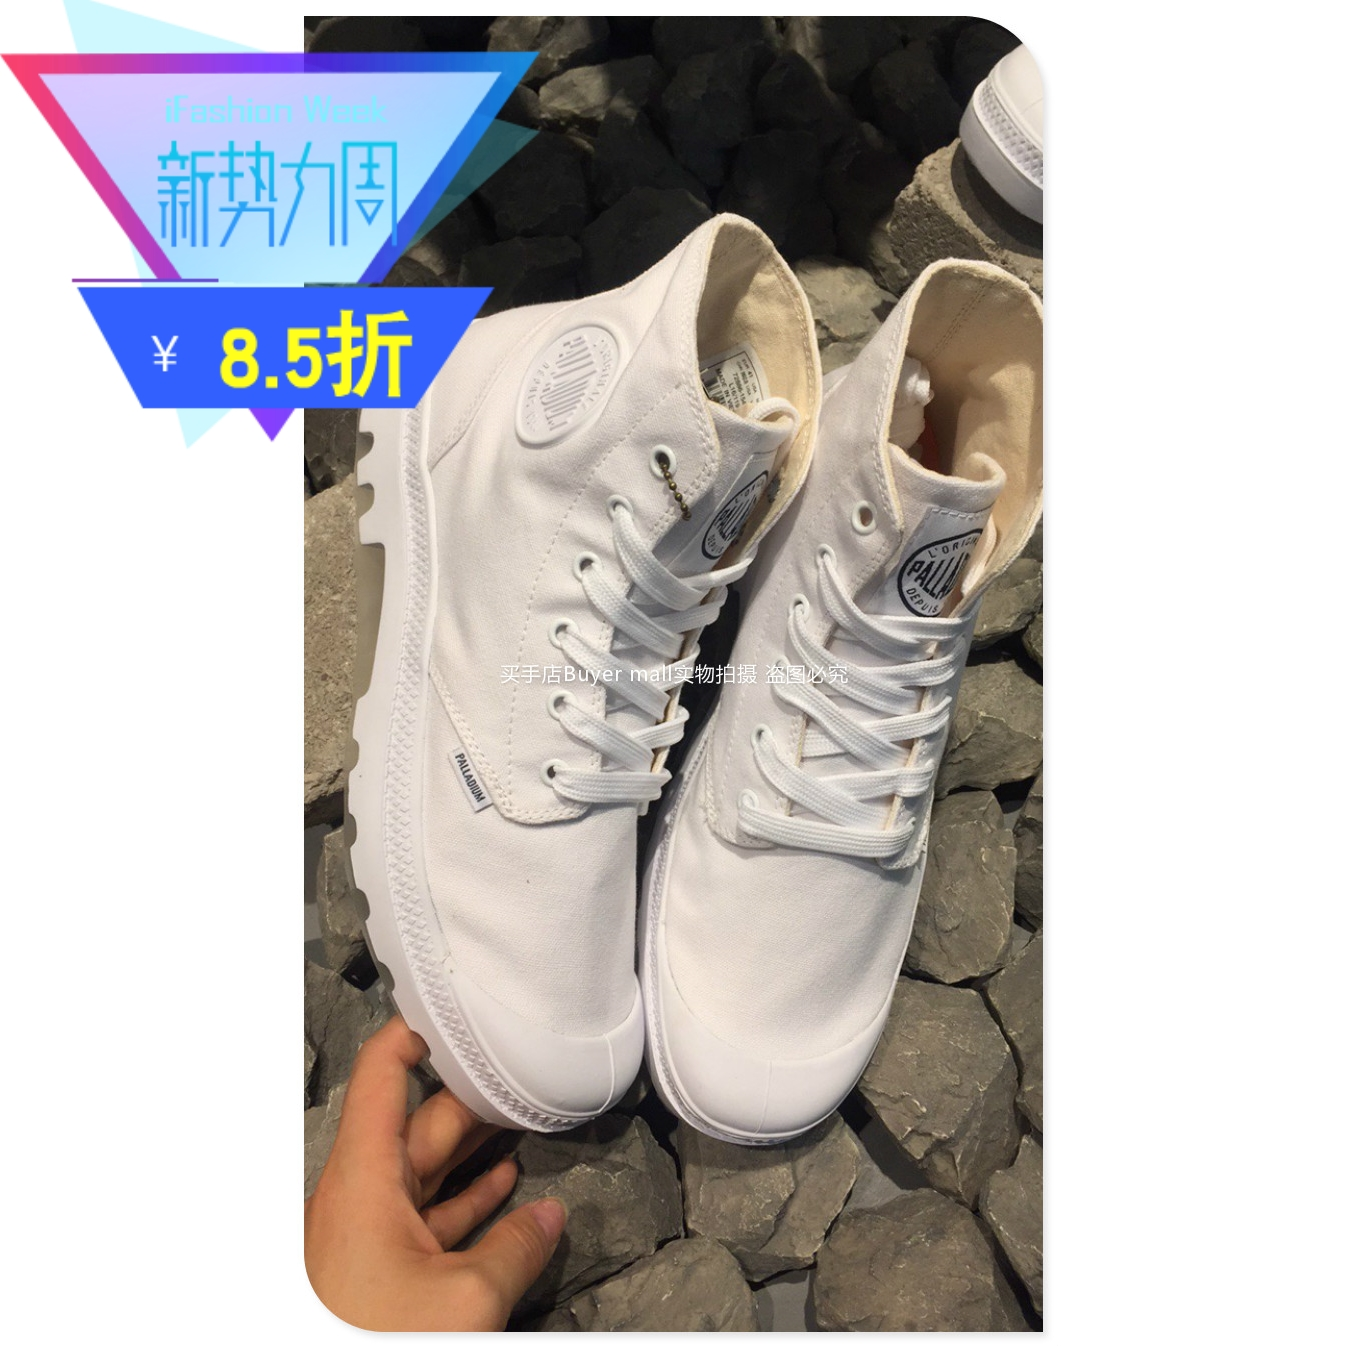 PALLADIUM帕拉丁流行男鞋帆布鞋女鞋中高帮情侣鞋军靴PDQH8S116U